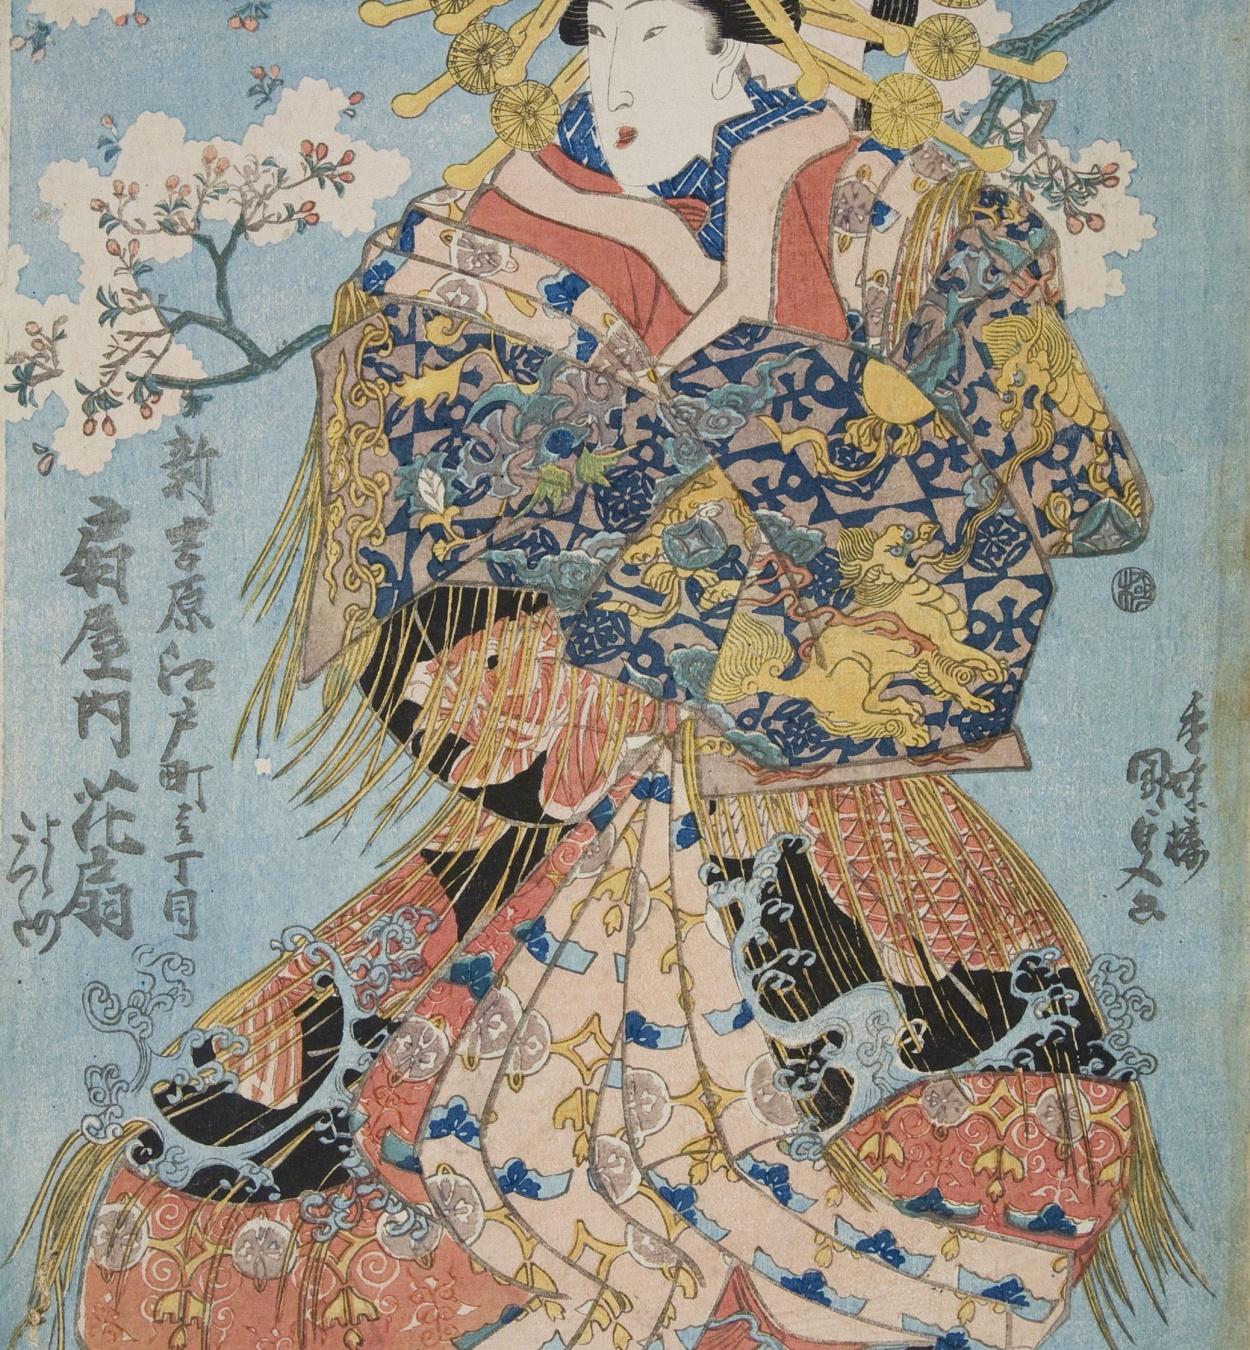 Utagawa Kunisada (Toyokuni III) - Ukiyo-e (album with seventy pictures) - End of the 18th century – mid-19th century [1]